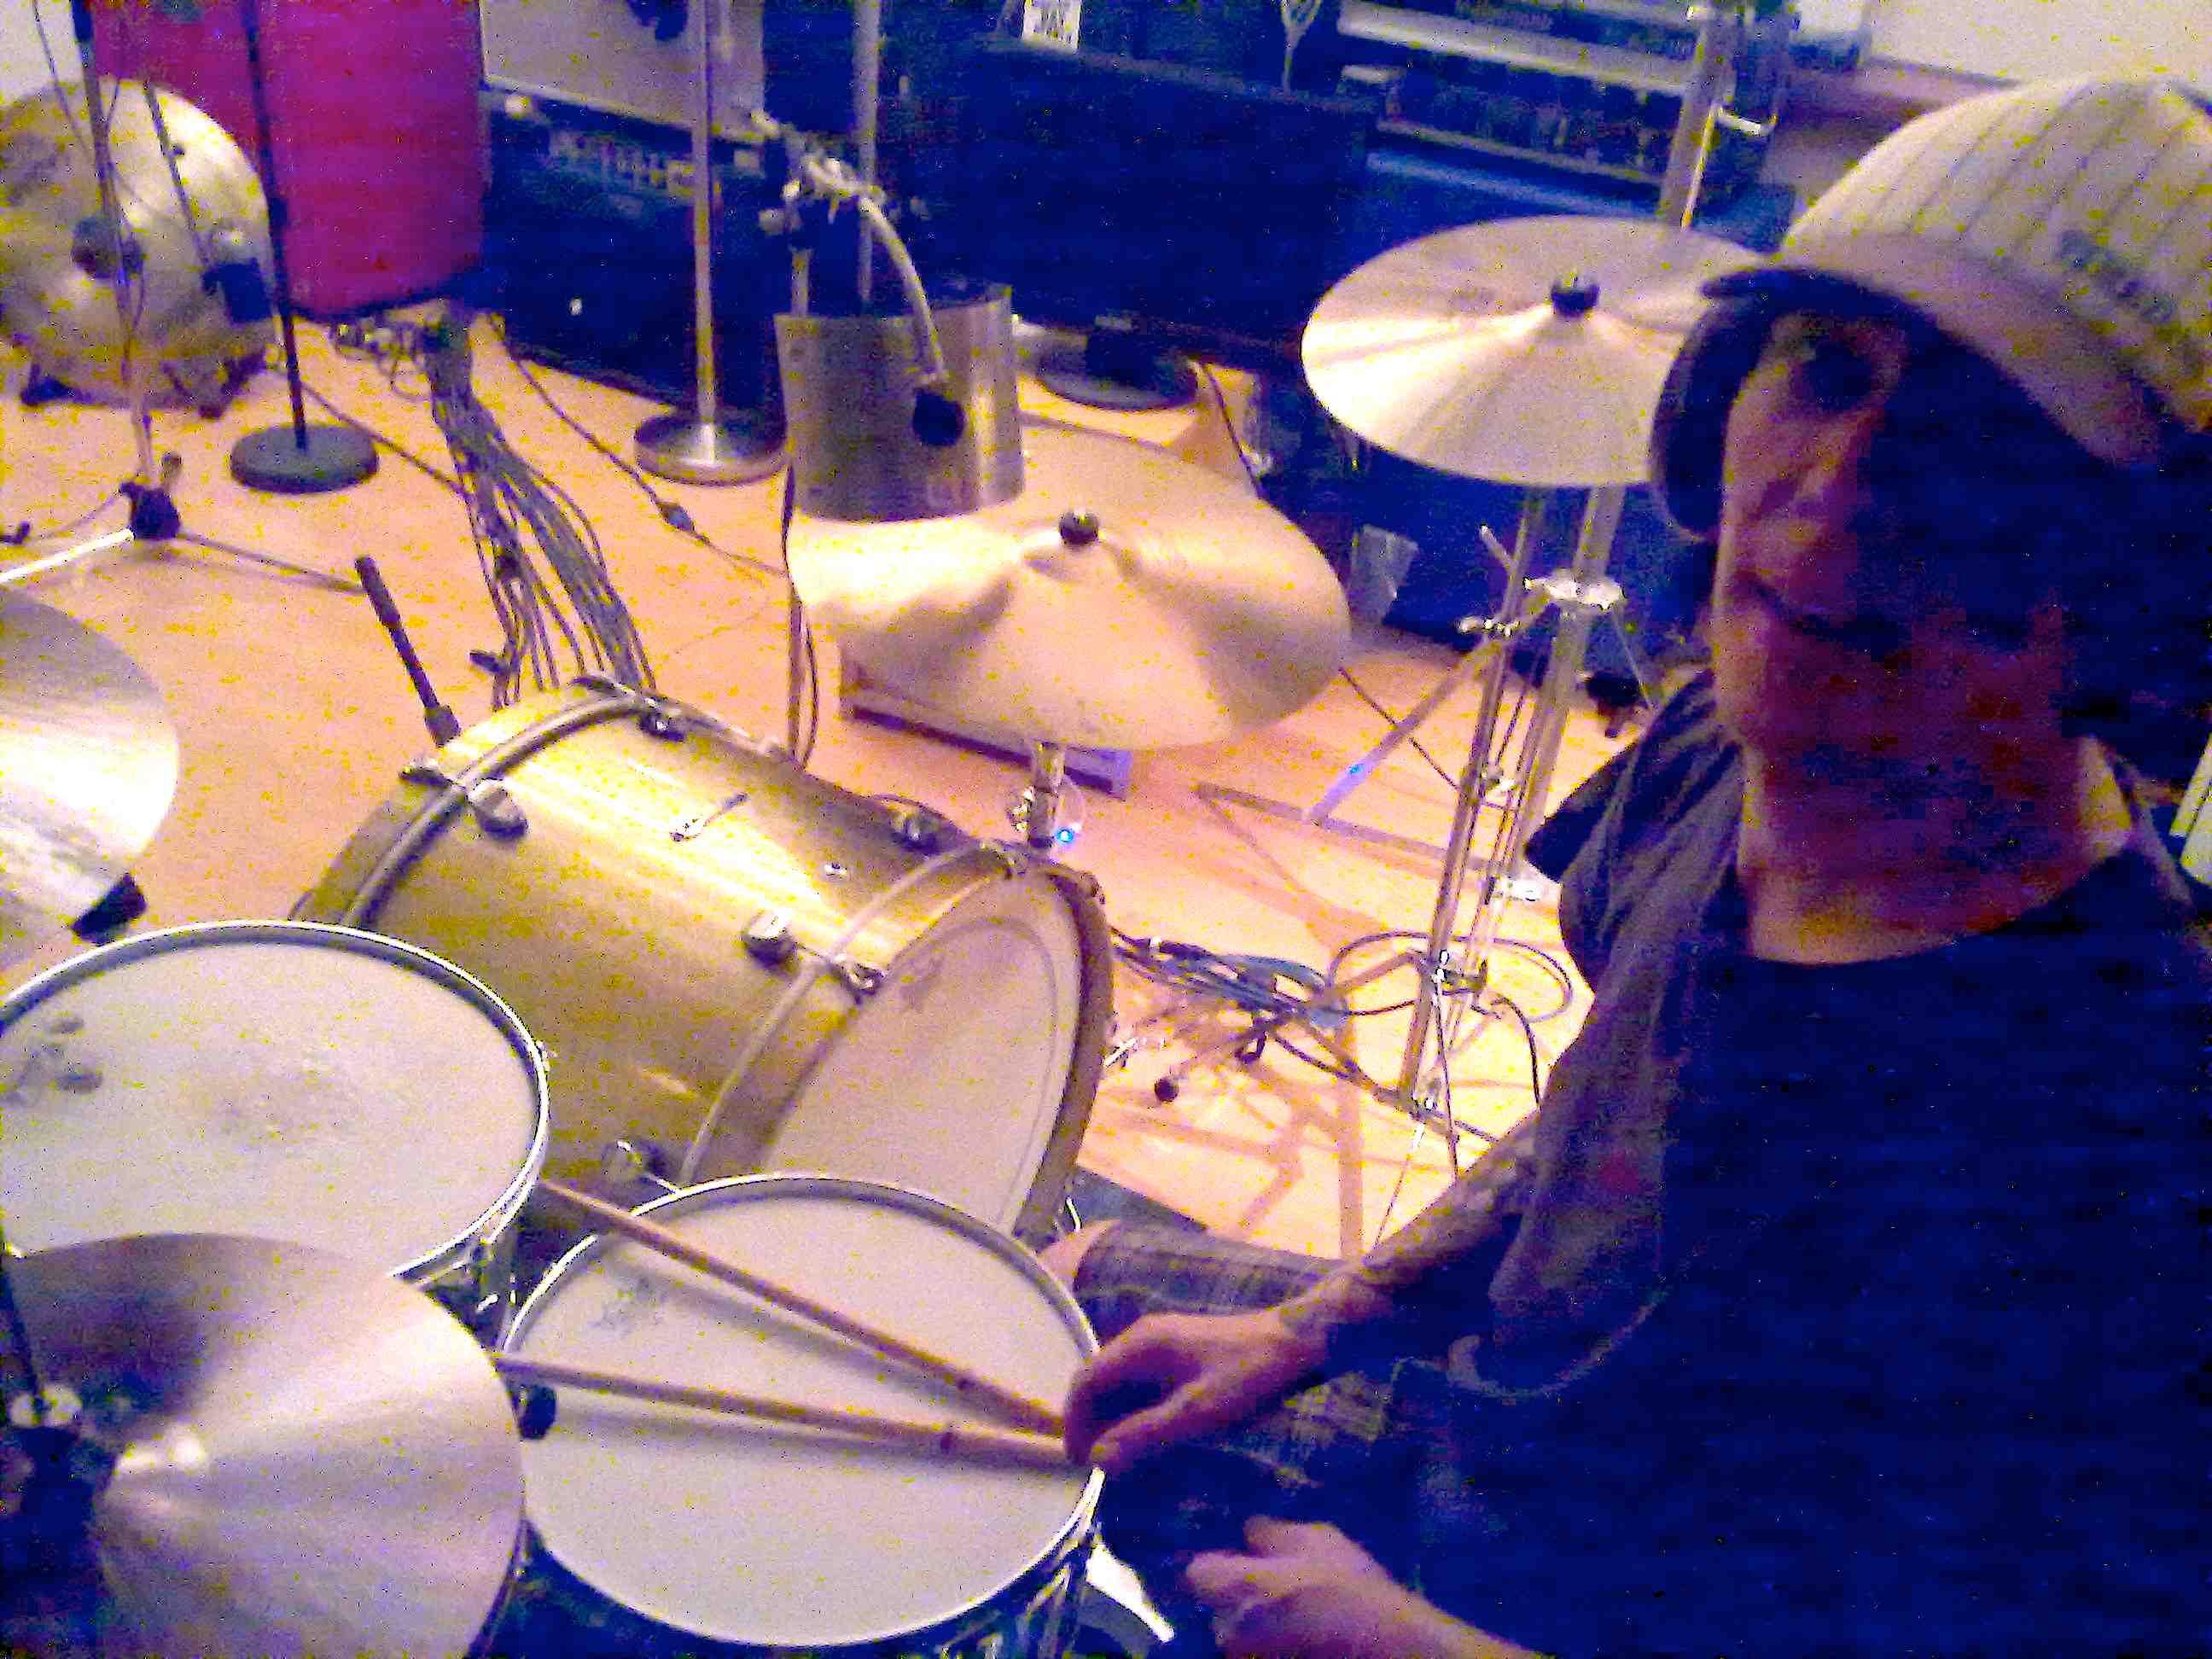 mdh_heinz_drum2.jpg